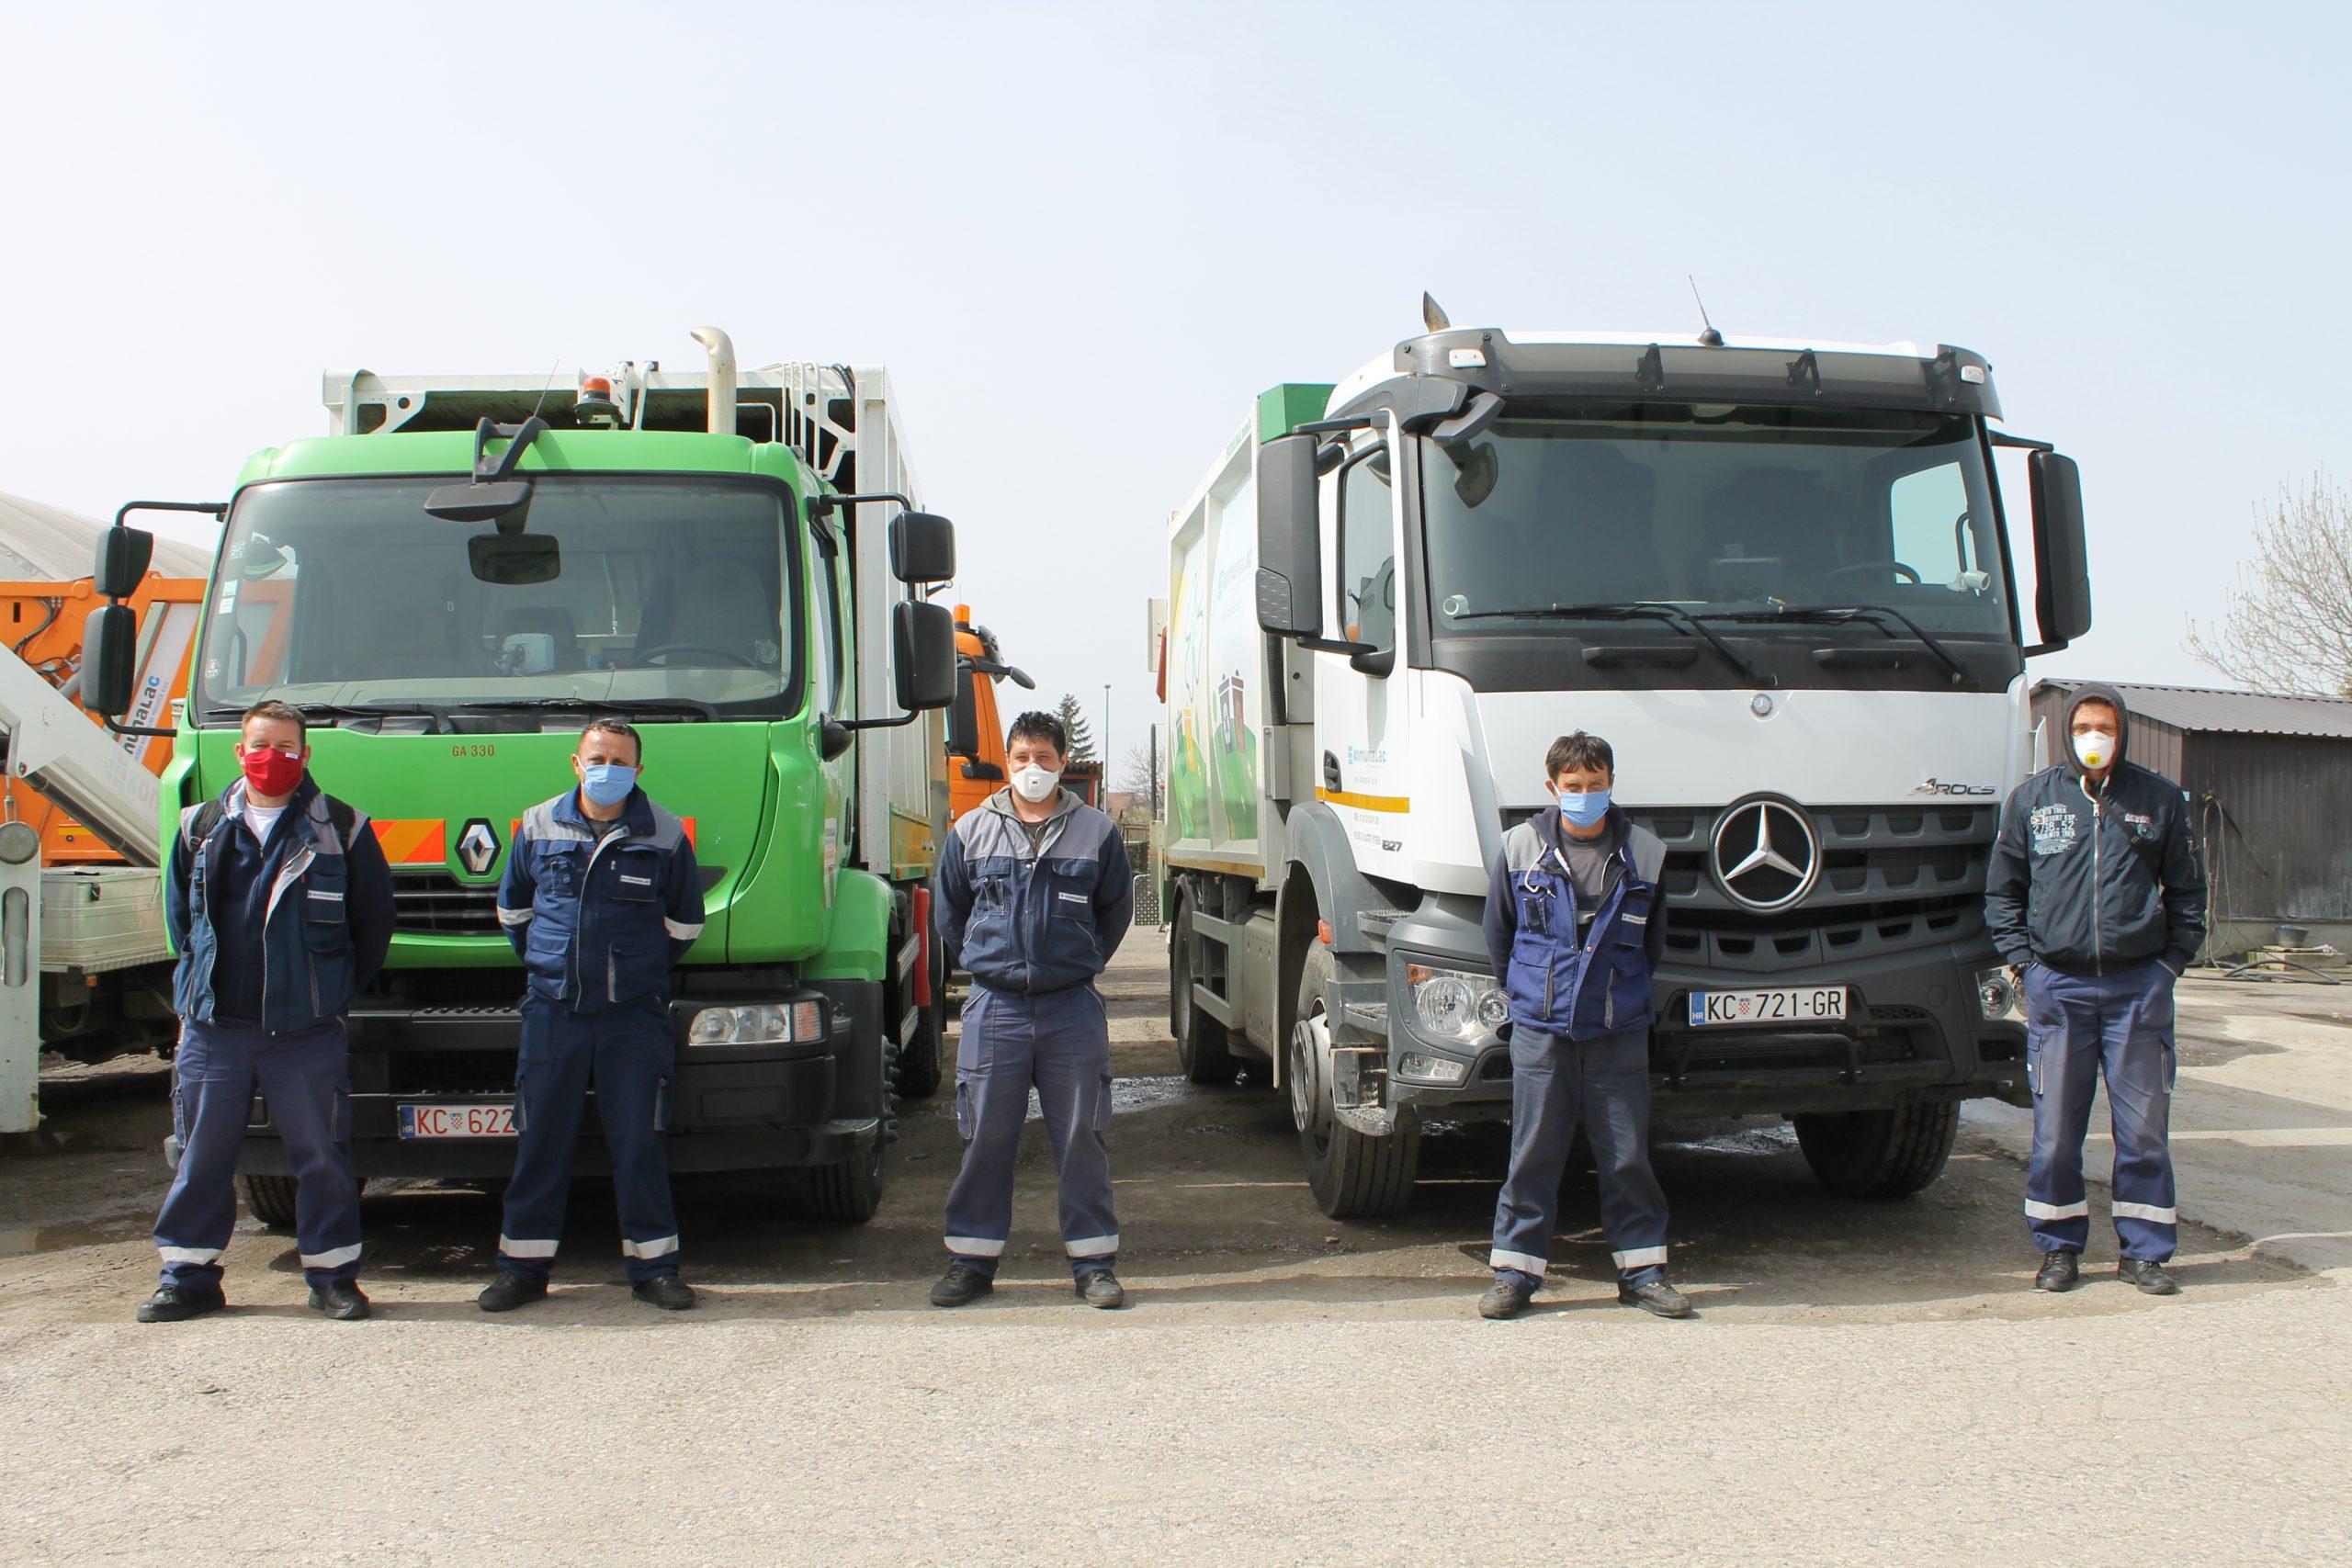 GKP Komunalac otpad odvozi po rasporedu, zaposlenici koriste zaštitna sredstva